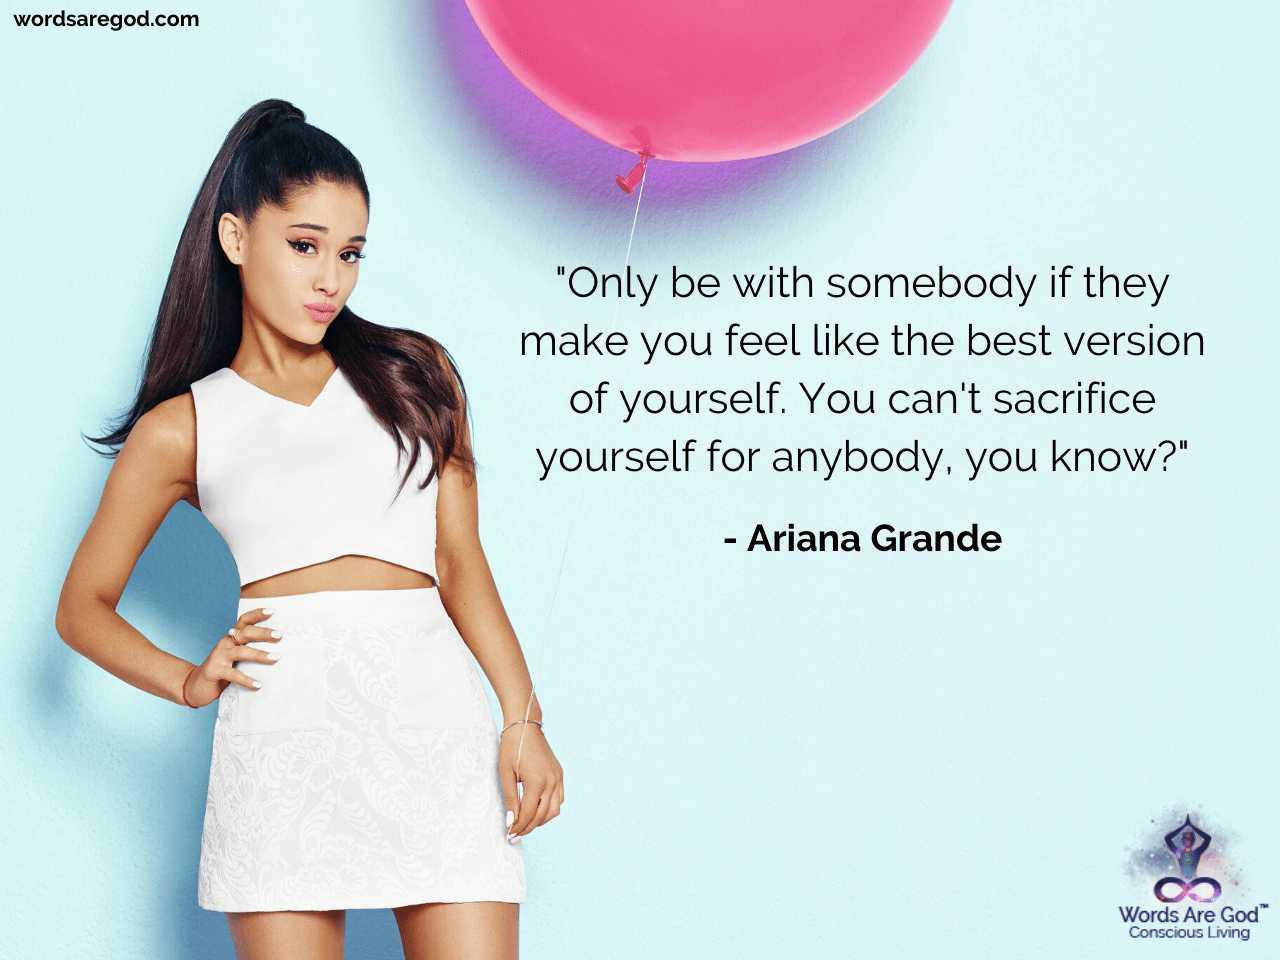 Ariana Grande Life Quote by Ariana Grande